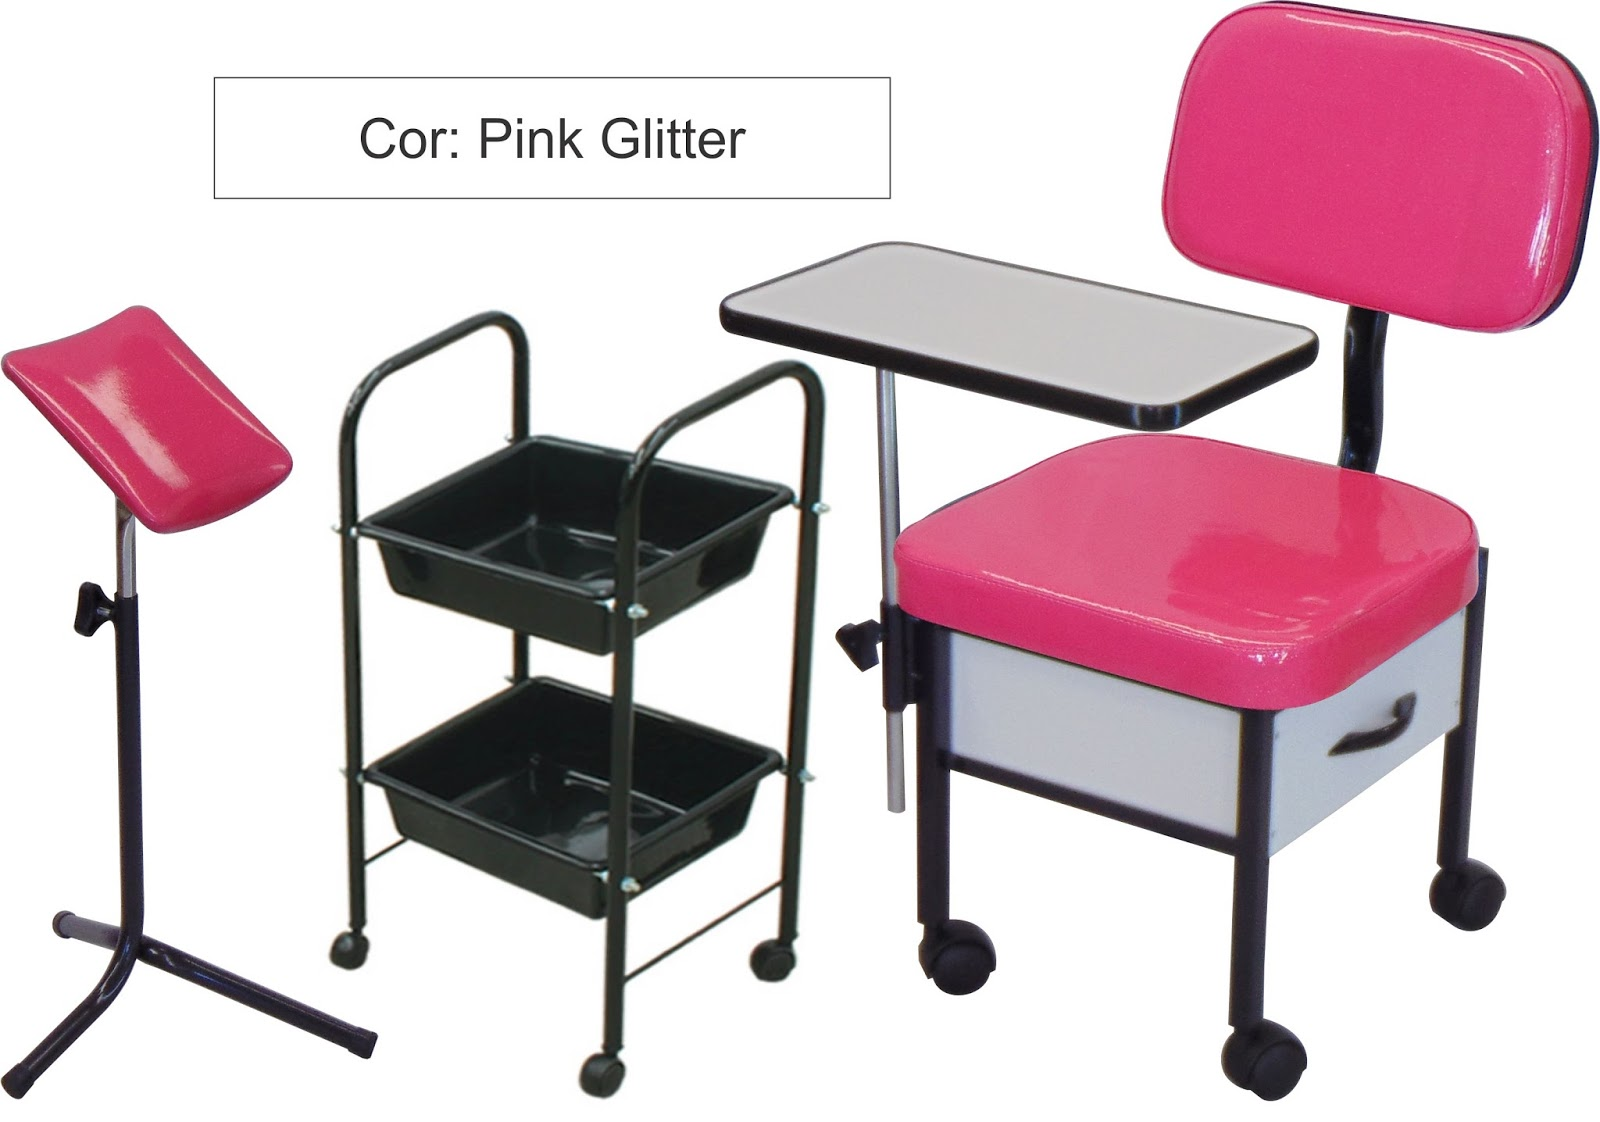 kit st pink glitter